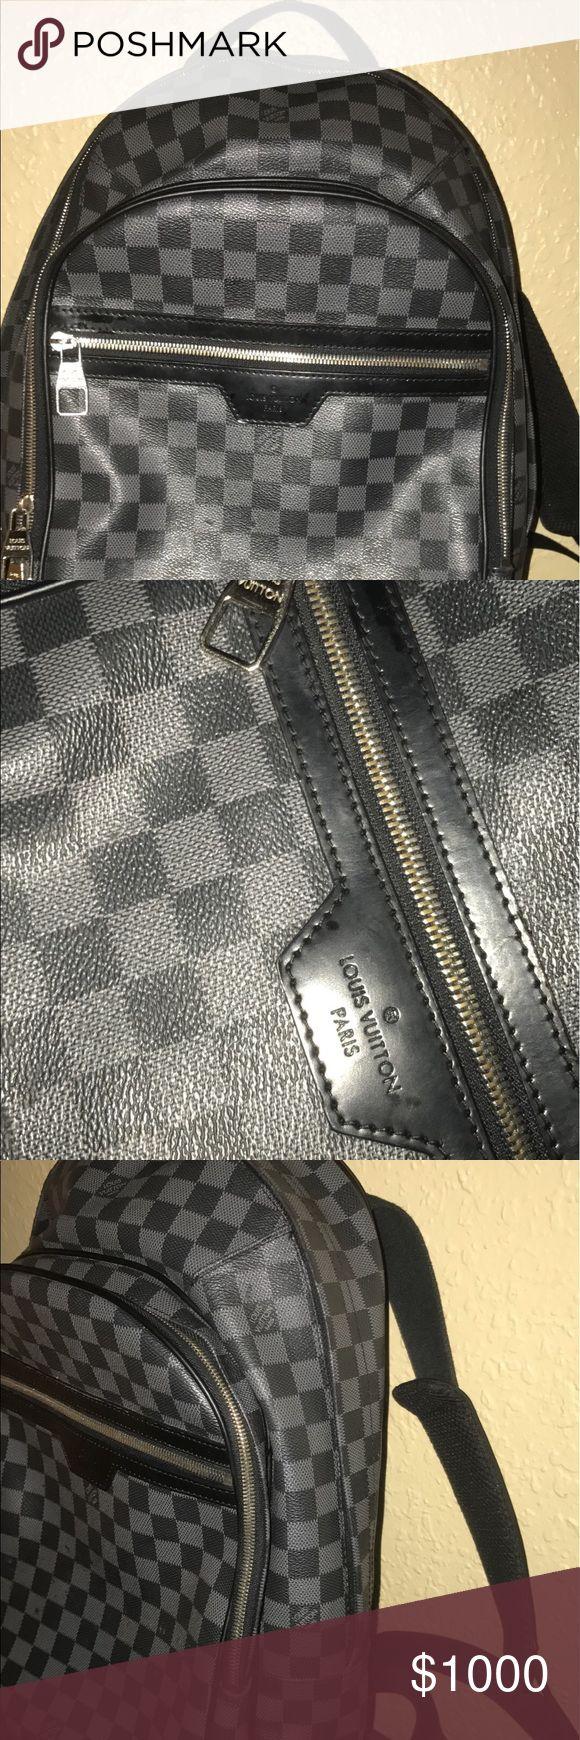 Louis Vuitton bookbag Black and gray back pack Louis Vuitton Bags Backpacks